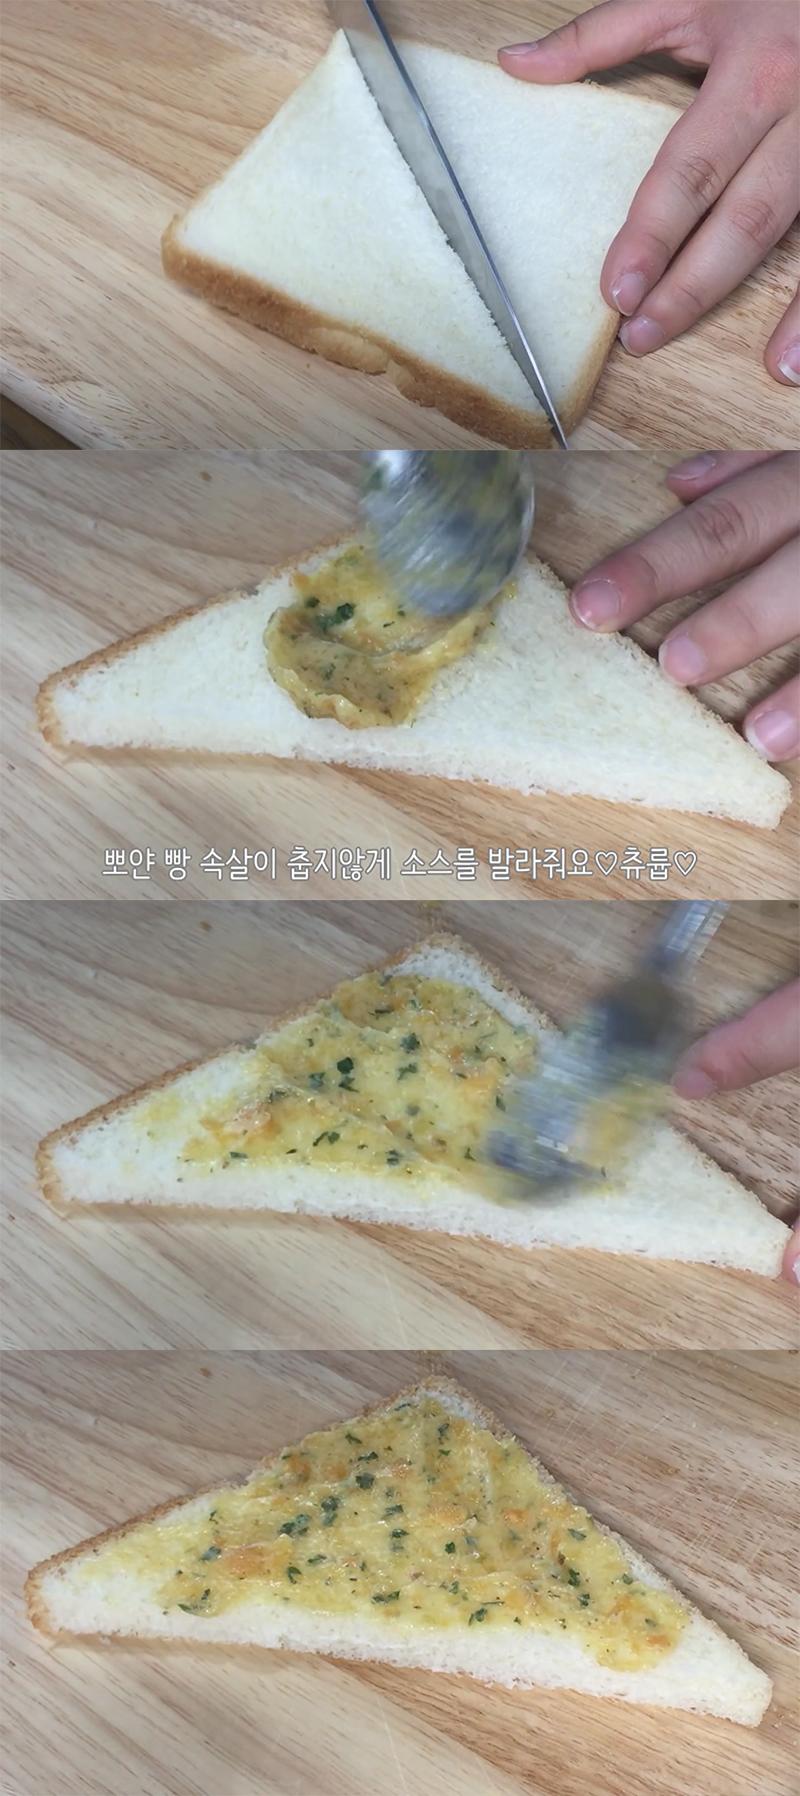 garlic-bread 03